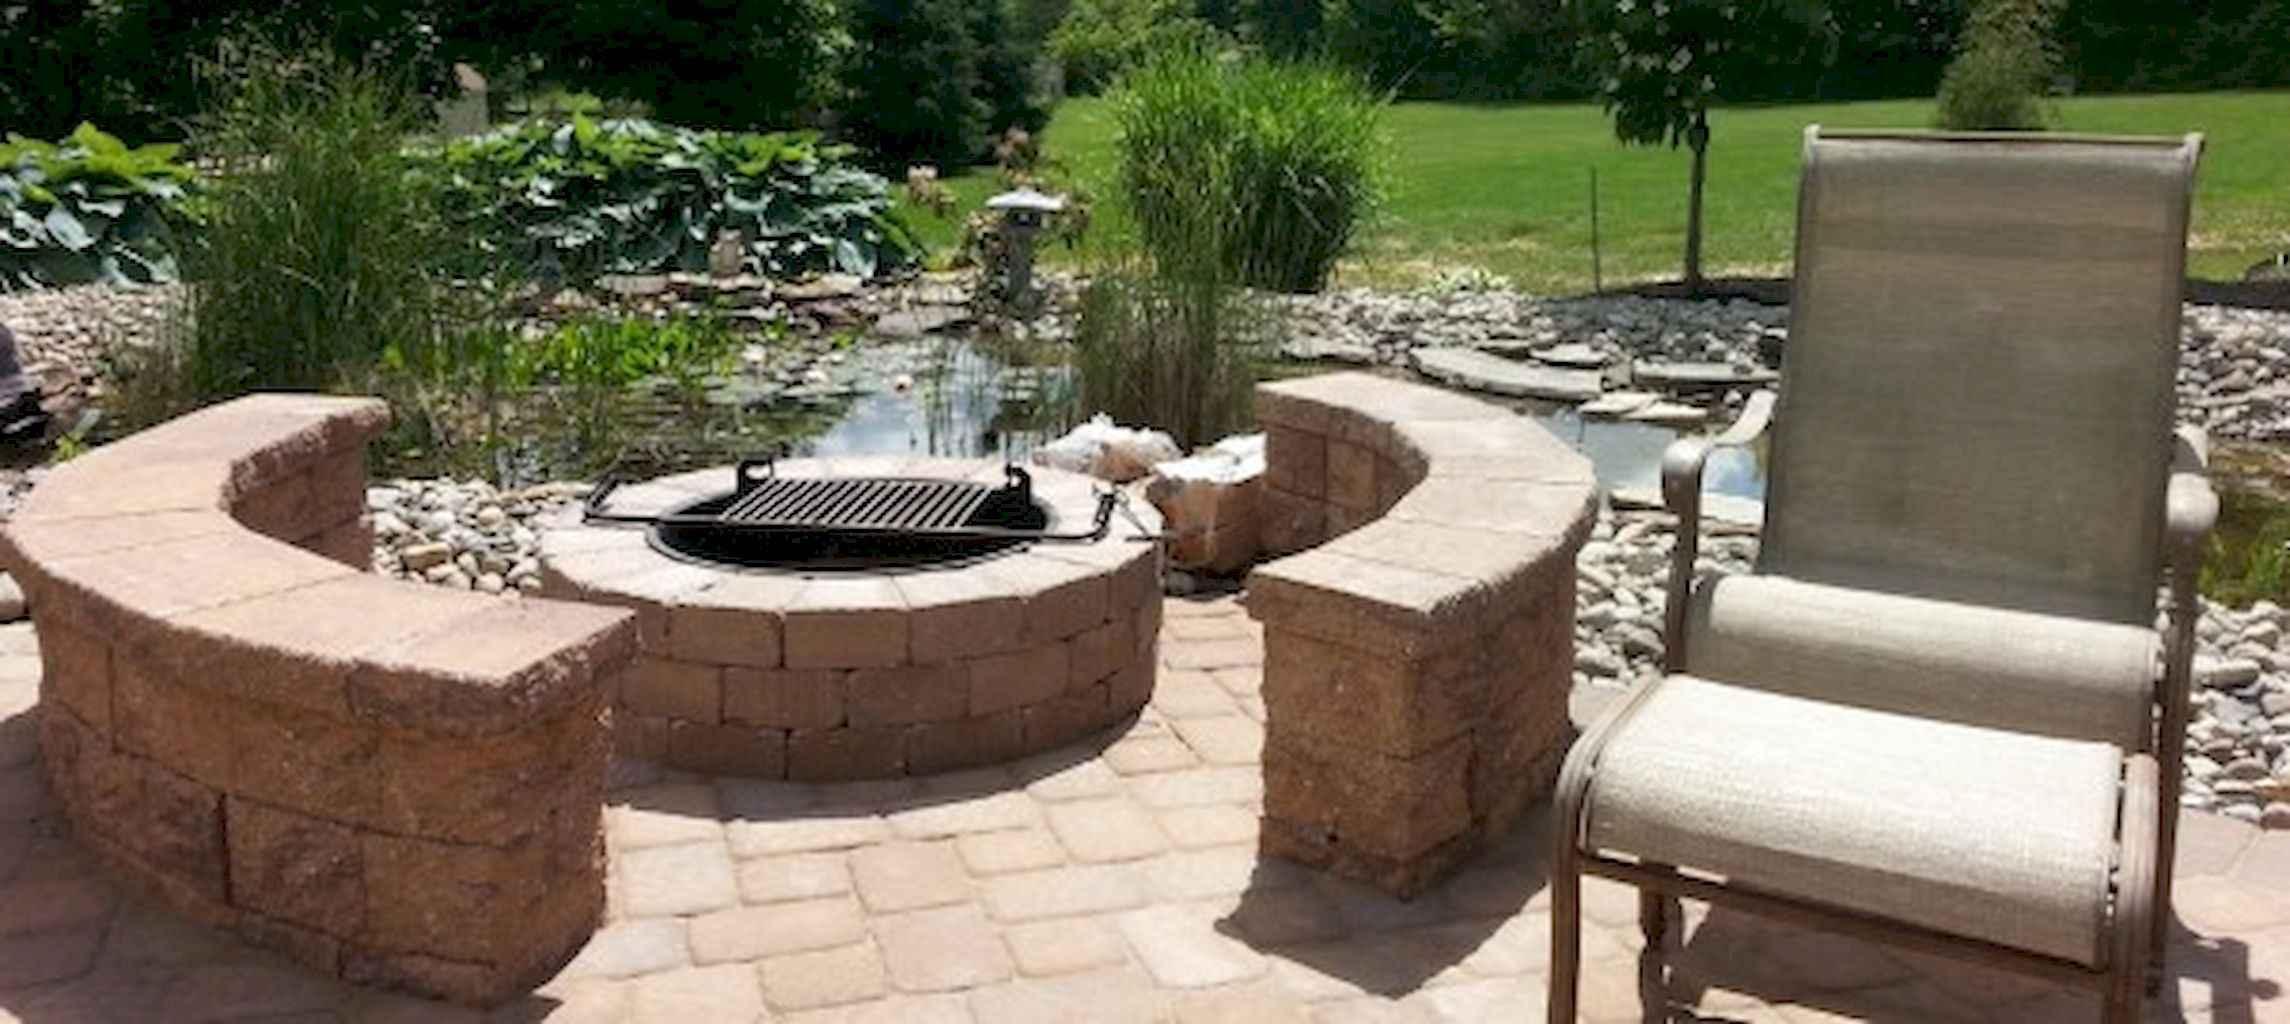 60 Beautiful Backyard Fire Pit Ideas Decoration and Remodel (42)